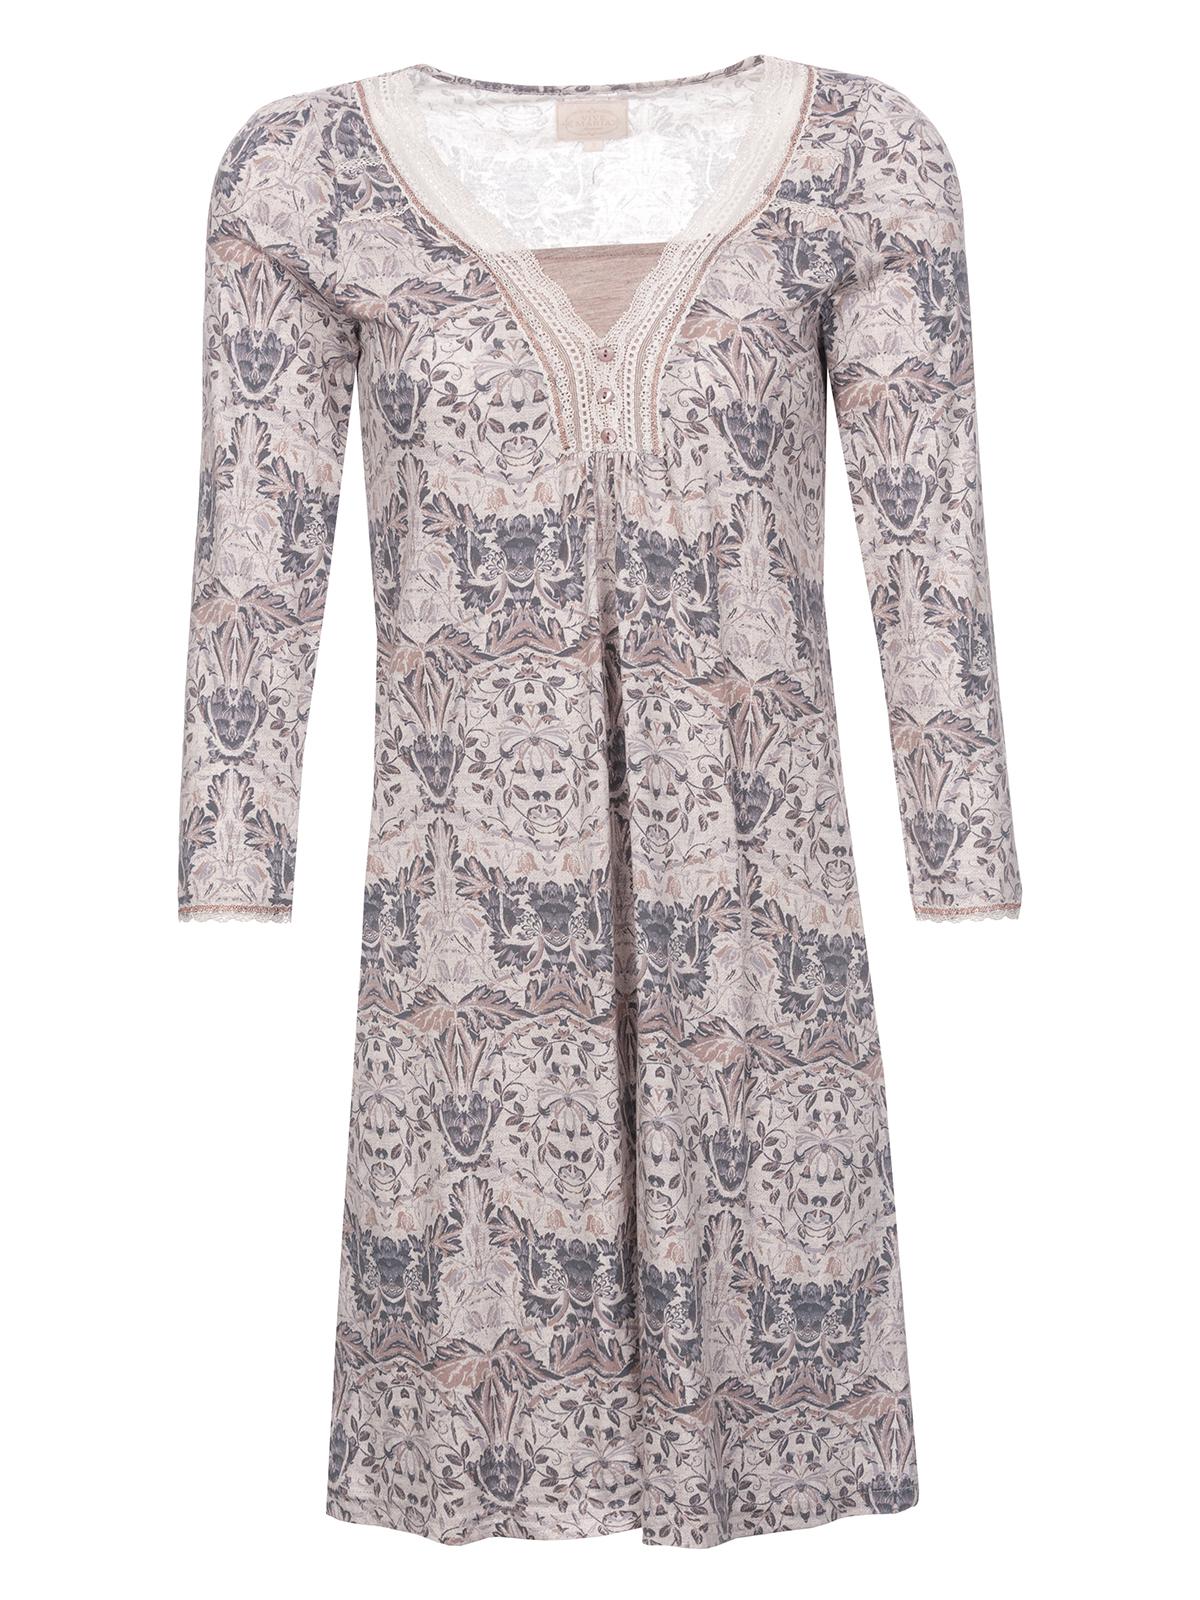 Waesche - Vive Maria Soft Baroque Damen Nachthemd Allover – Größe S  - Onlineshop NAPO Shop